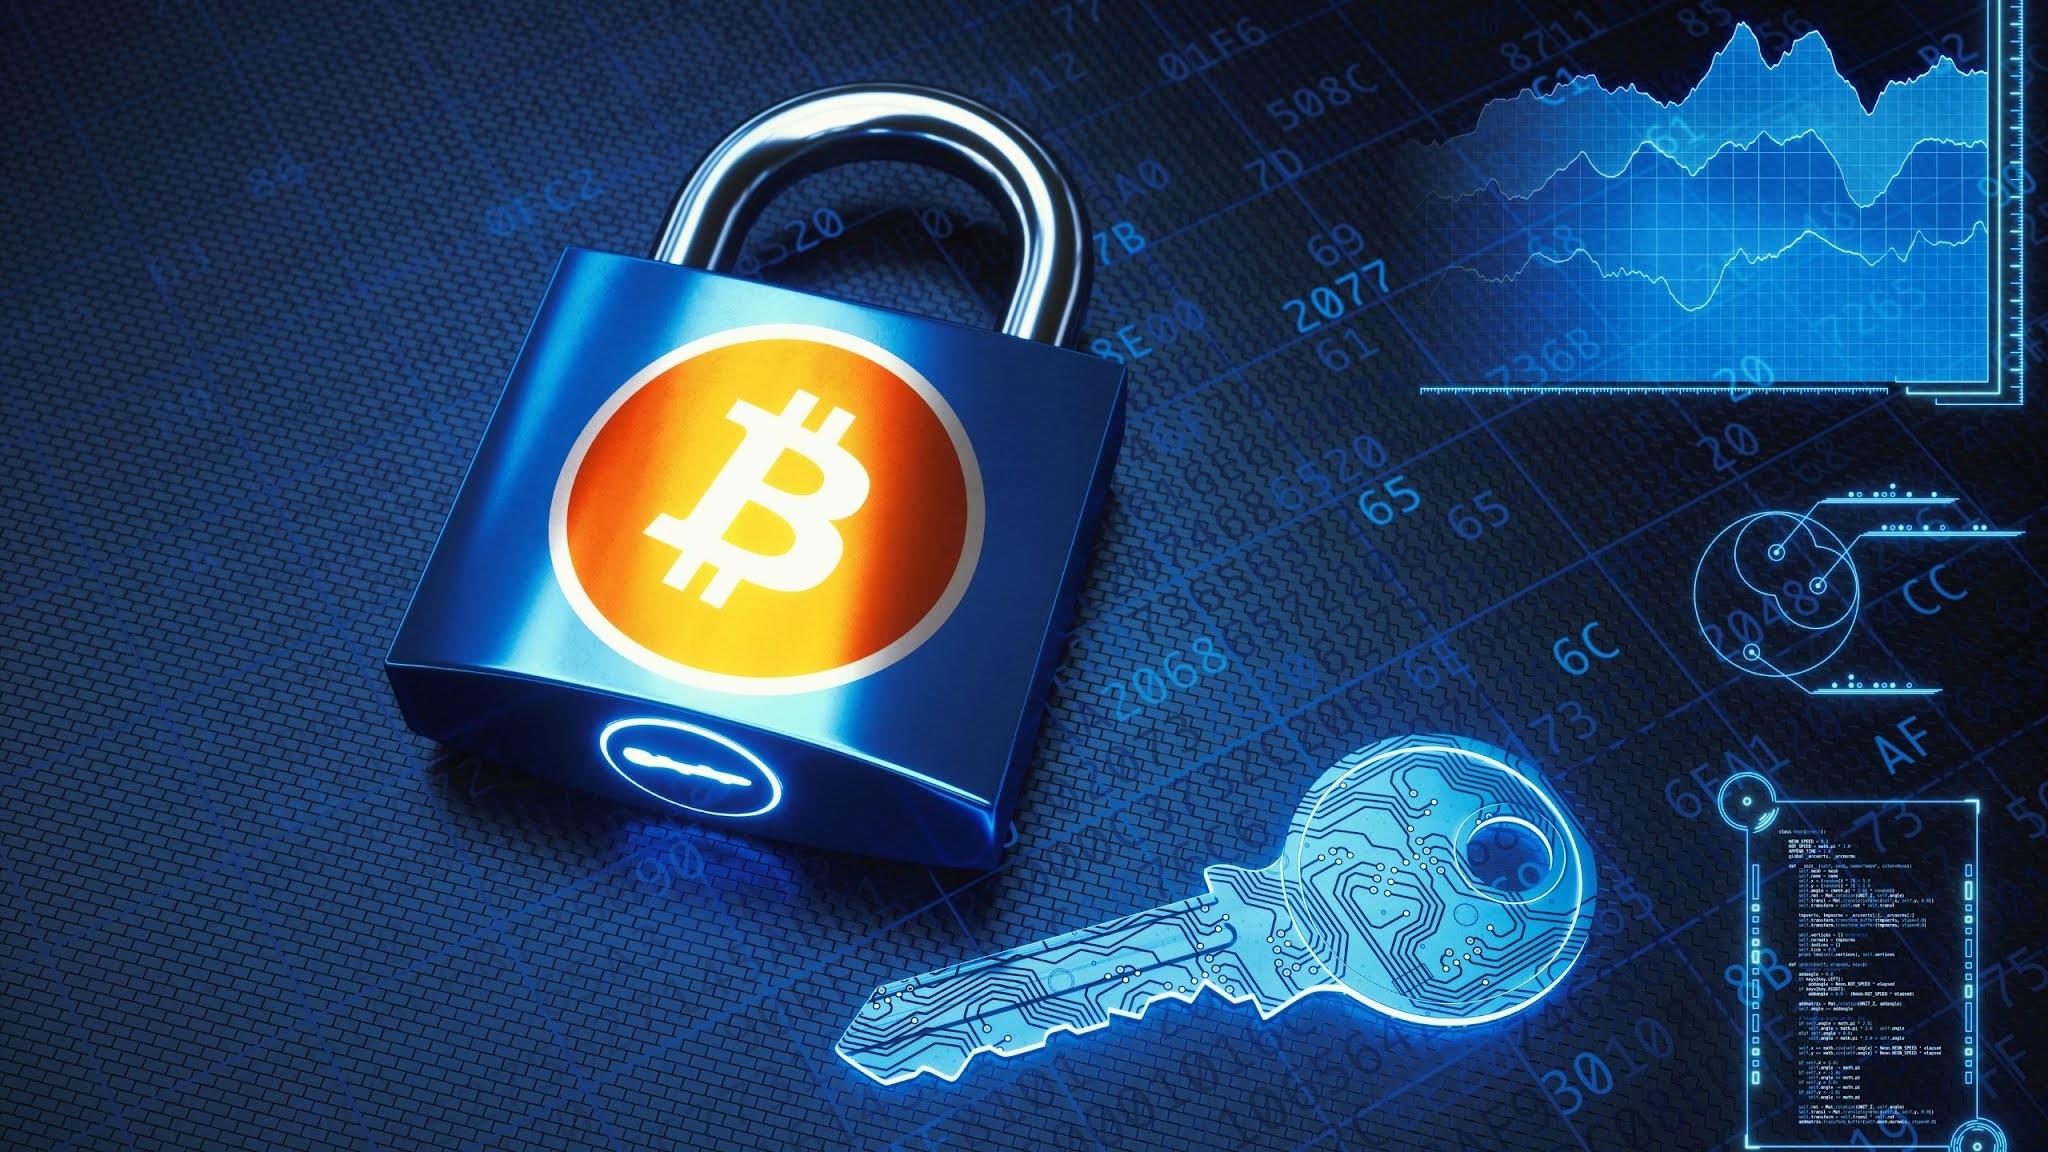 kripto para güvenliği